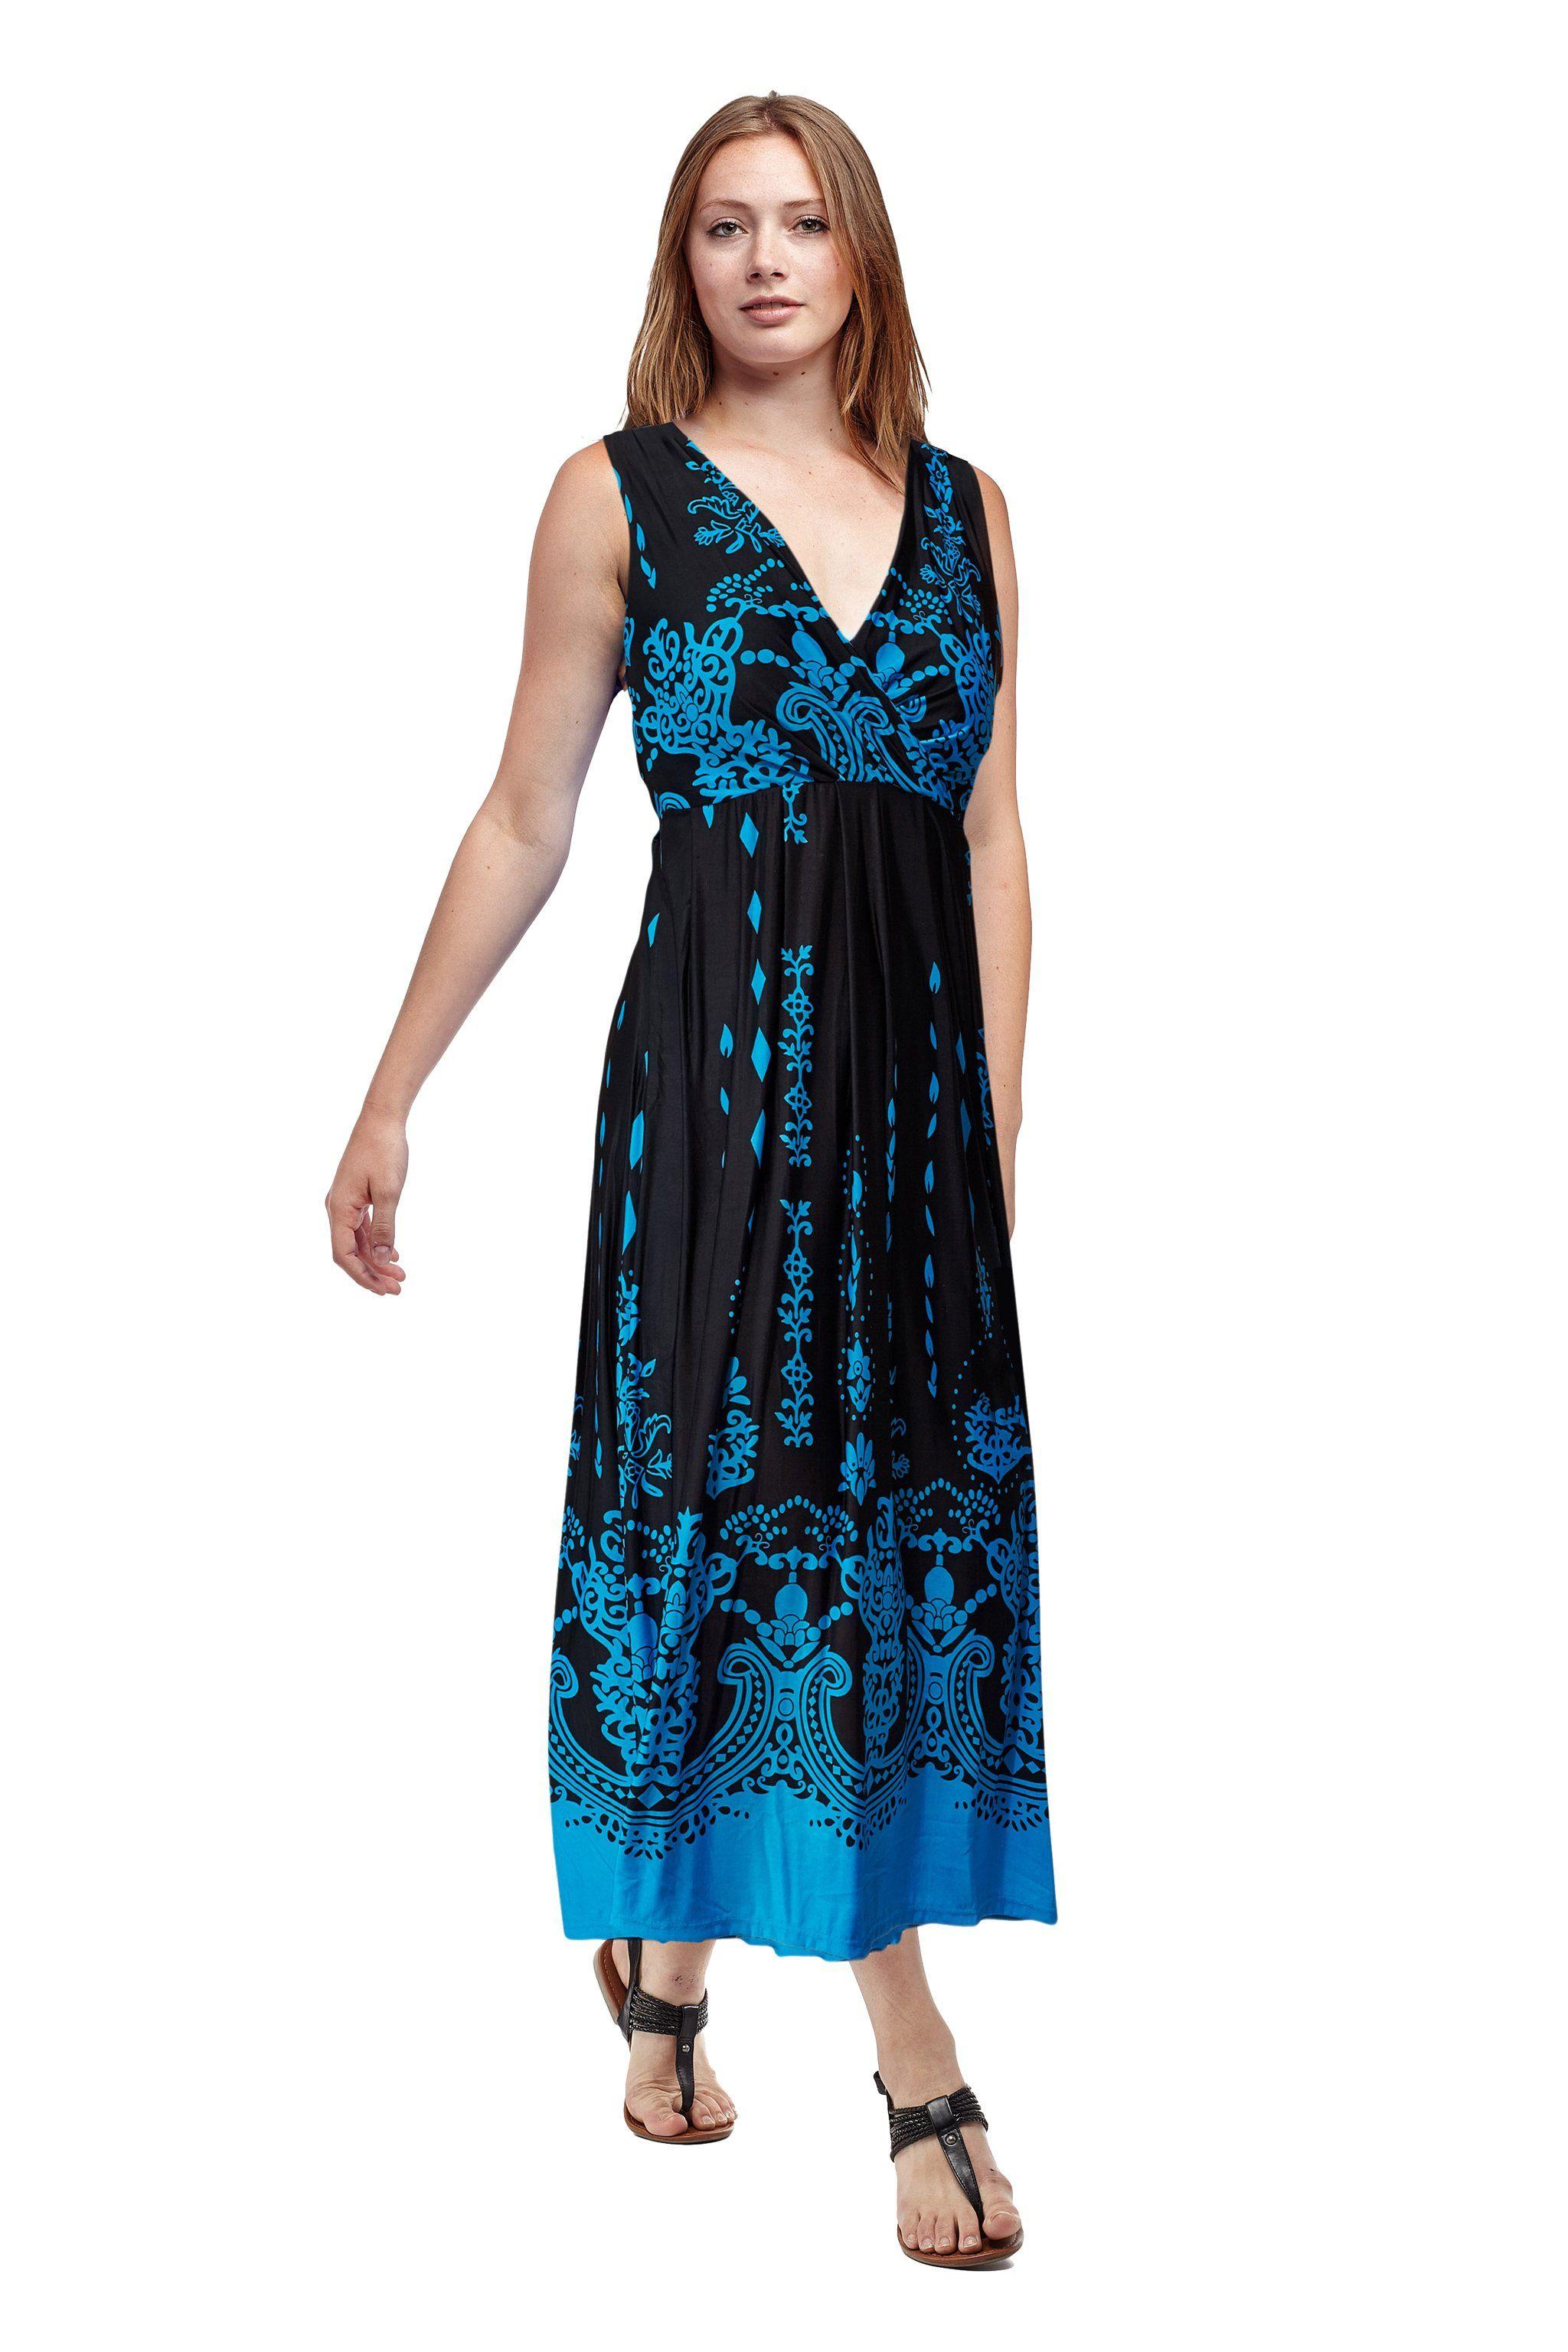 Photo of La Cera Paisley Border Print Sleeveless Printed Maxi Dress – S – 6-8 / Black/Turquoise